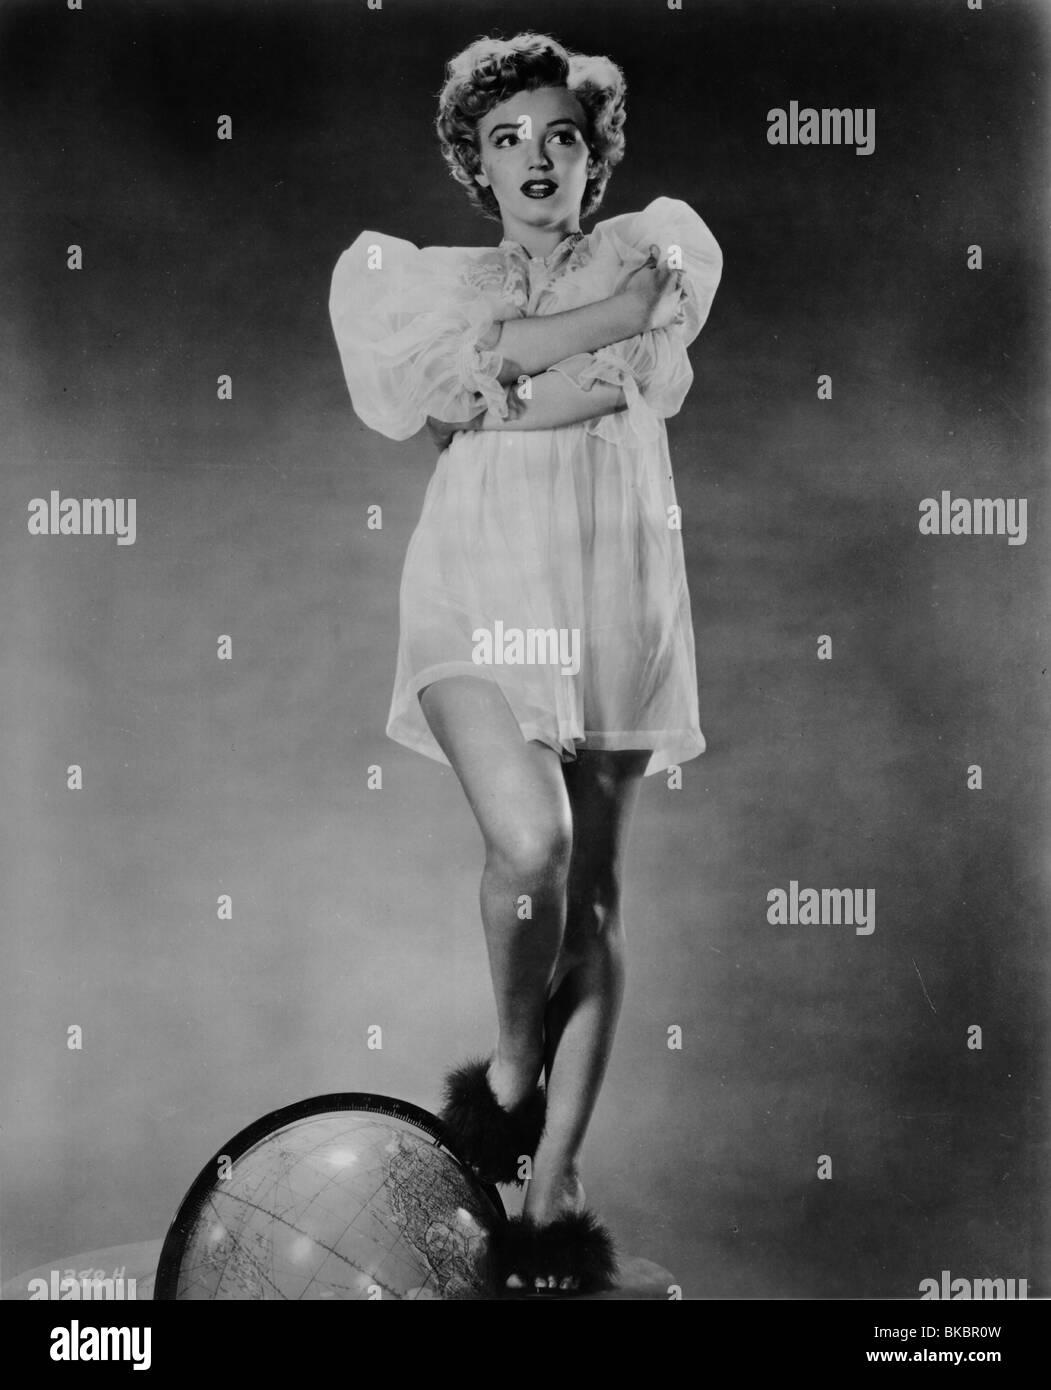 MARILYN MONROE PORTRAIT - Stock Image